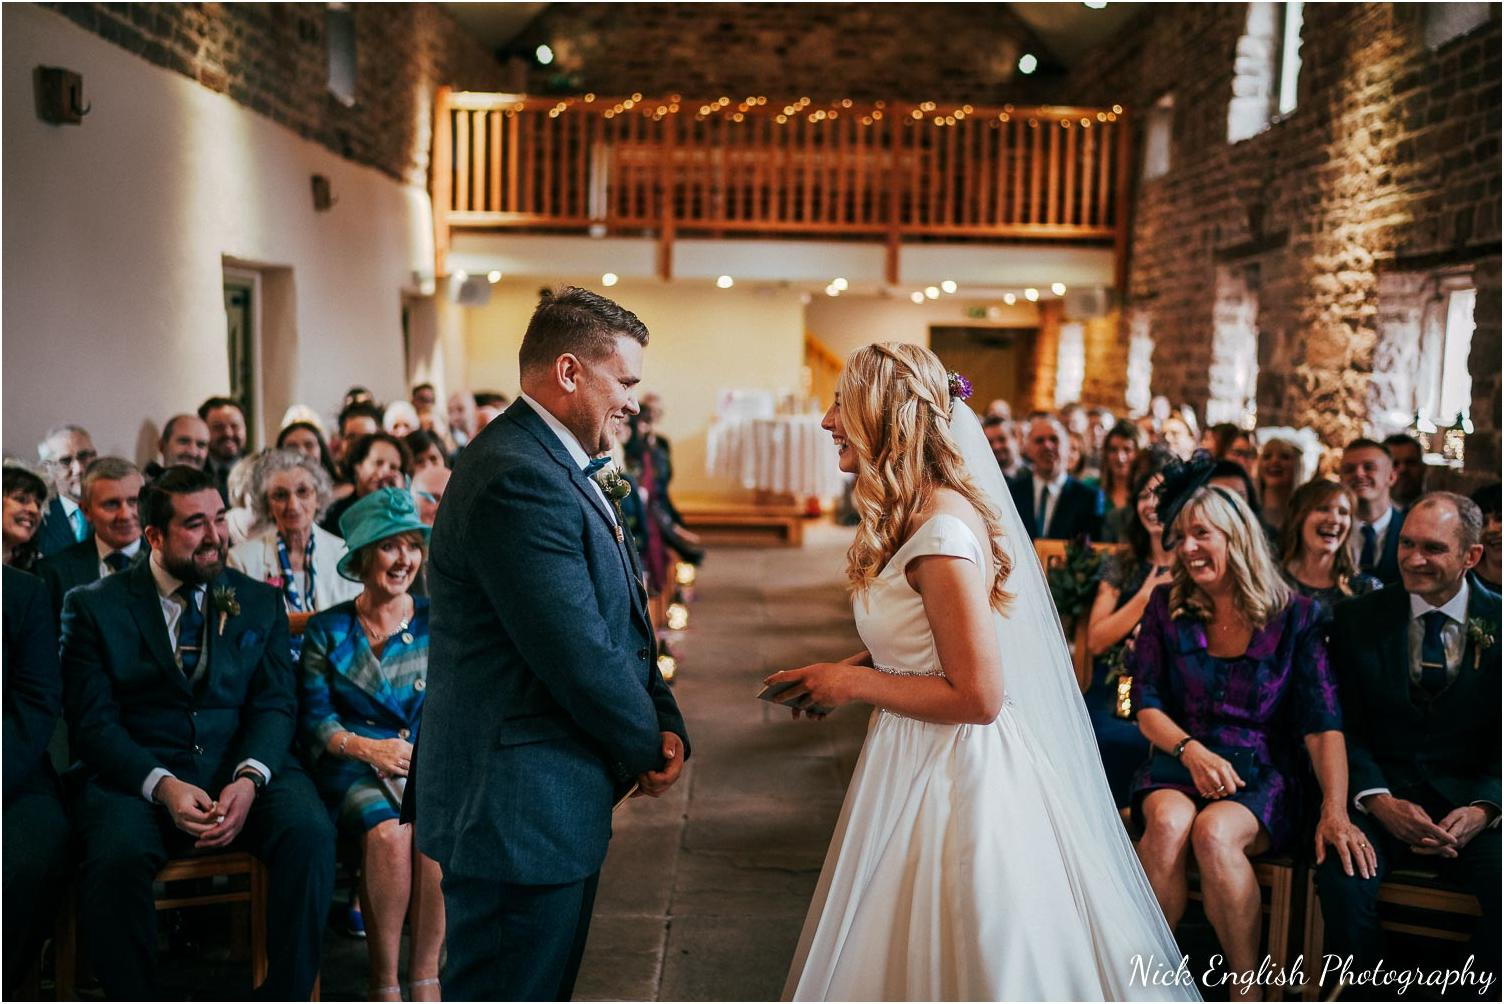 The_Ashes_Barn_Endon_Stoke_Wedding_Photographer-39.jpg